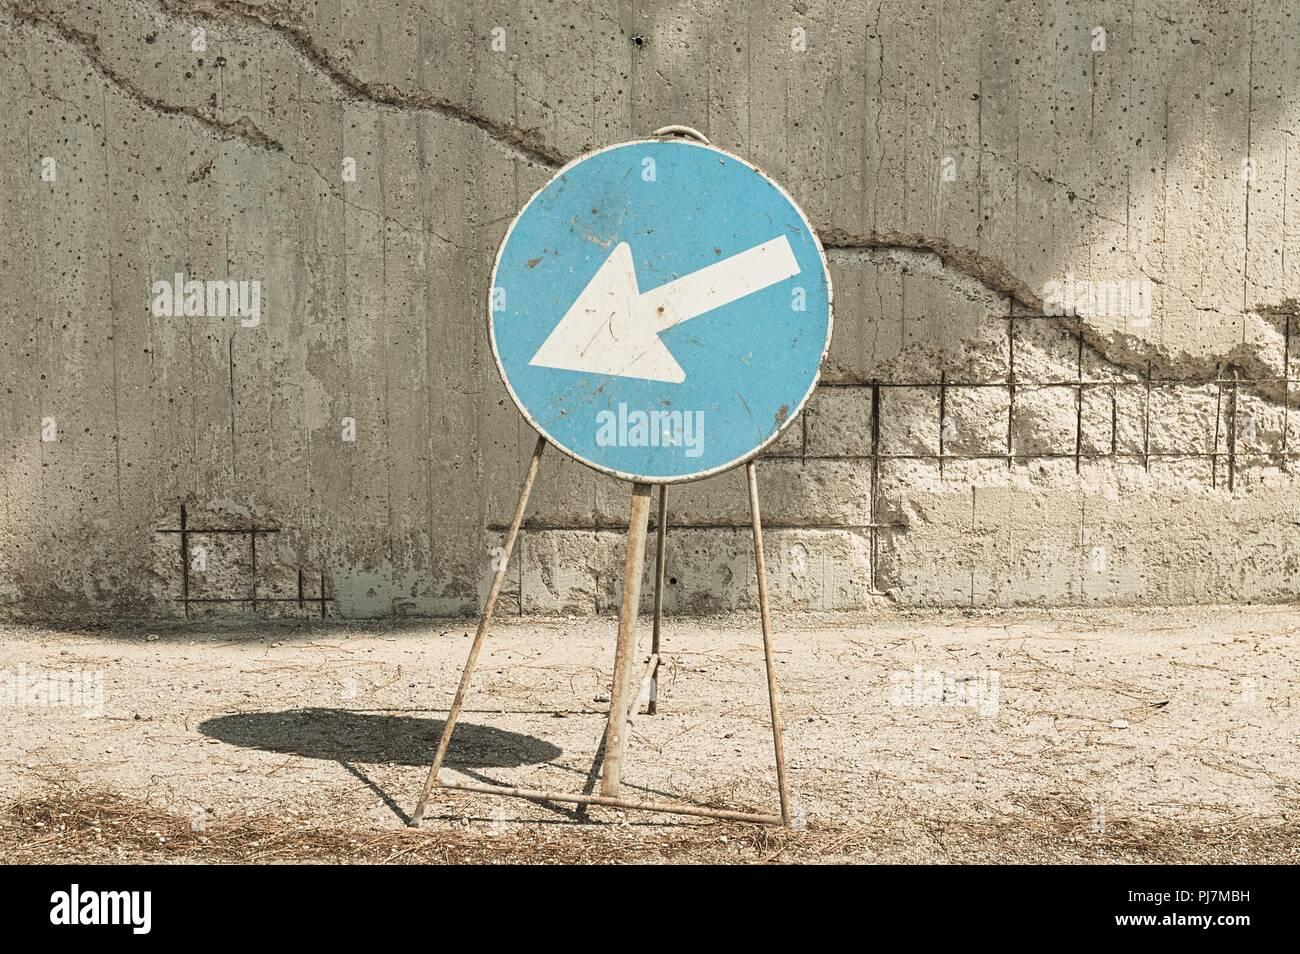 Turn left arrow - Work in progress (Pesaro, Italy, Europe) - Stock Image